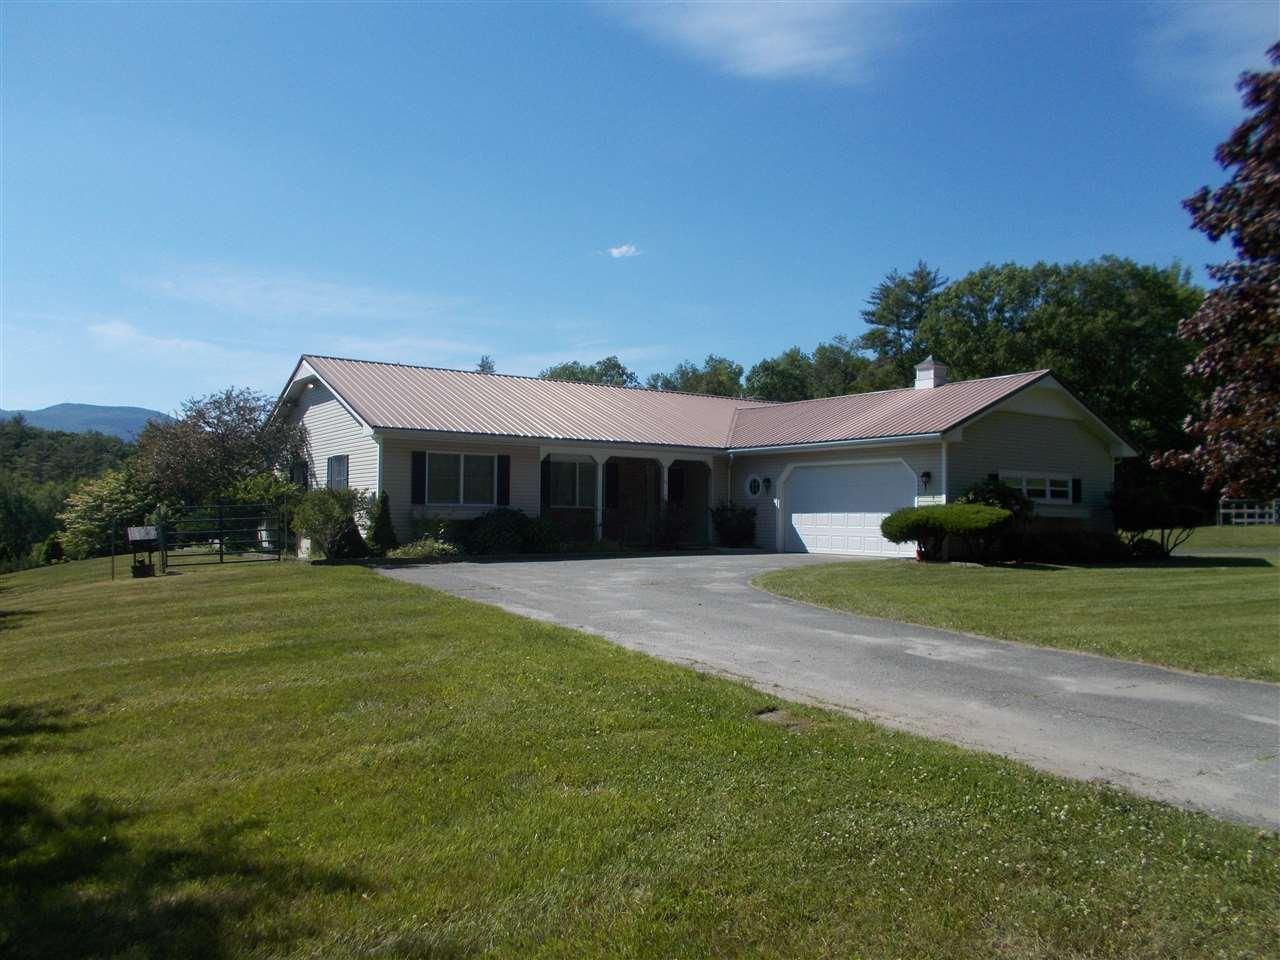 Sullivan County Nh Real Property